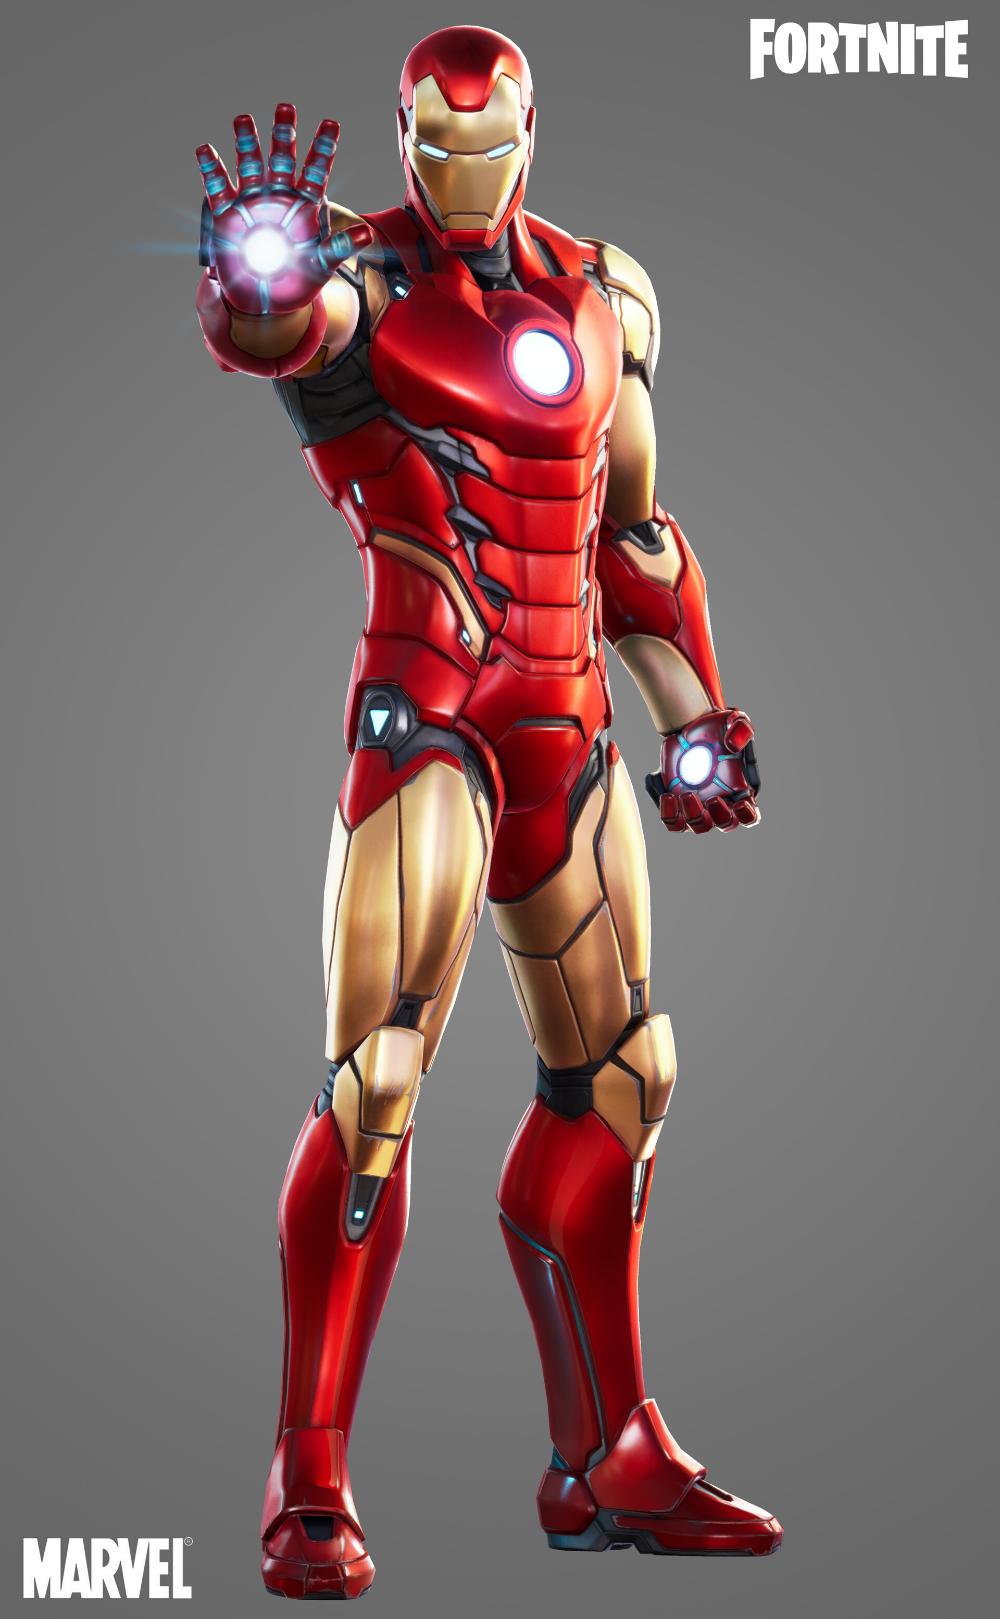 Artstation Fortnite Iron Man Suit Justin Holt Quadrinhos Pop Art Quadrinhos Anime